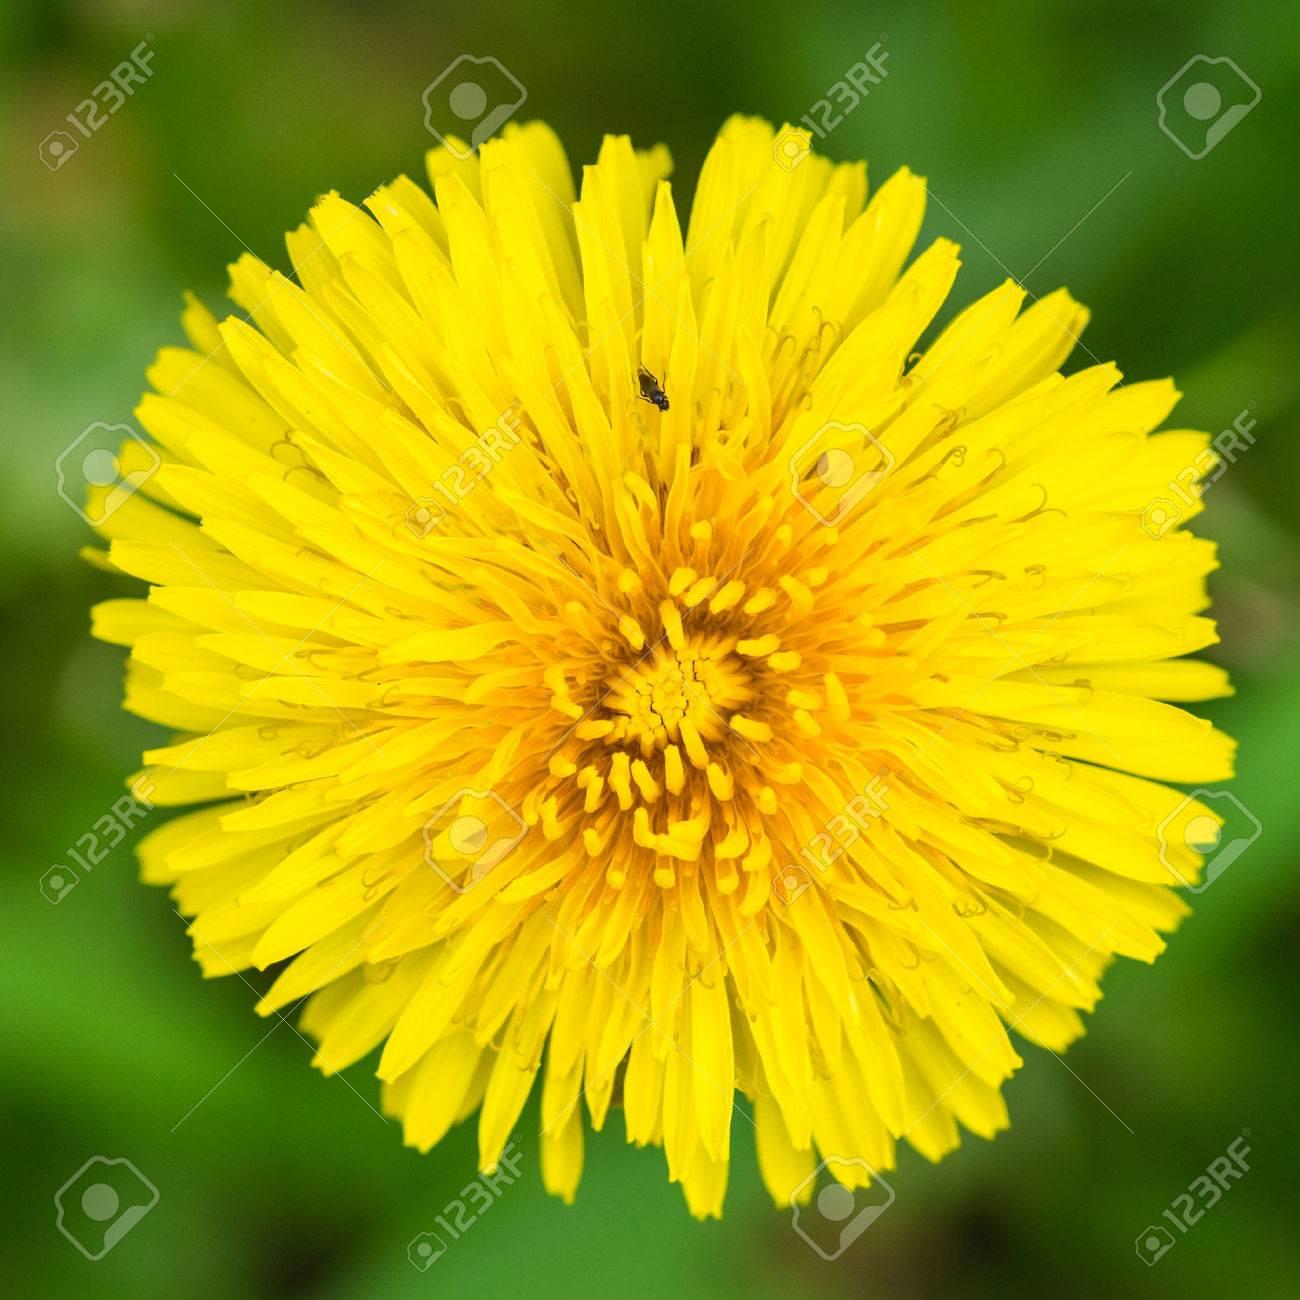 A macro shot of a yellow dandelion bloom. - 46976584